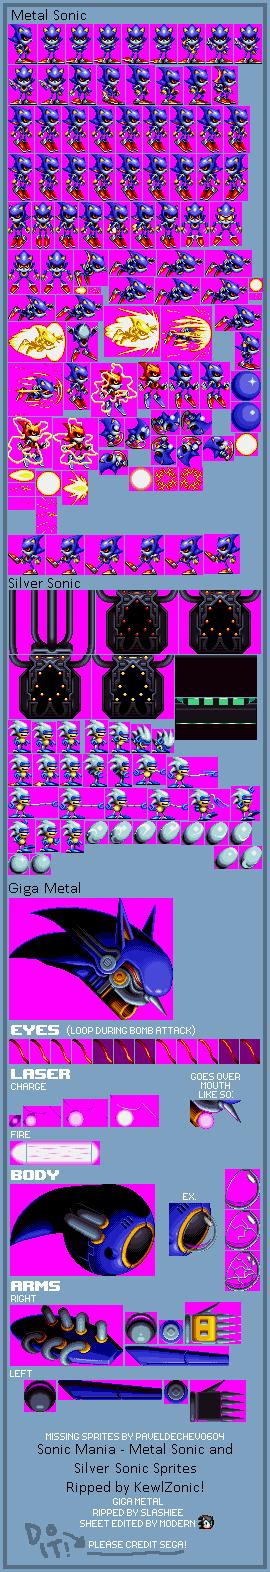 Sonic Mania Mod Apk